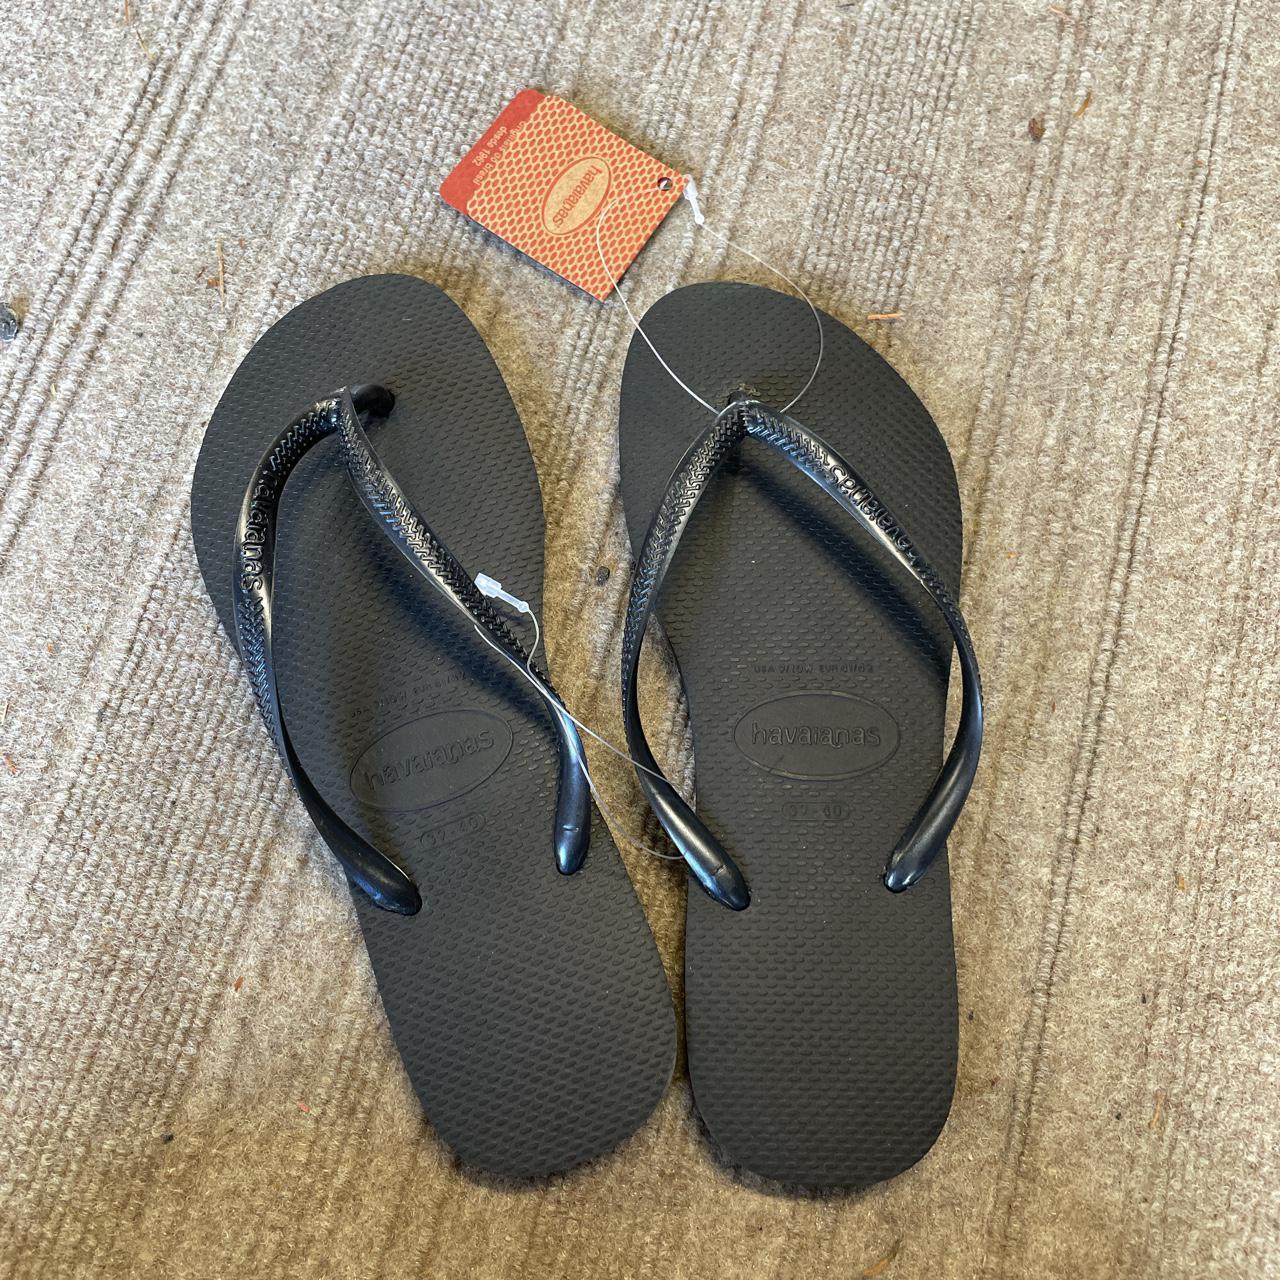 Product Image 1 - Black Havaiana's Flip Flops   ⭐️size